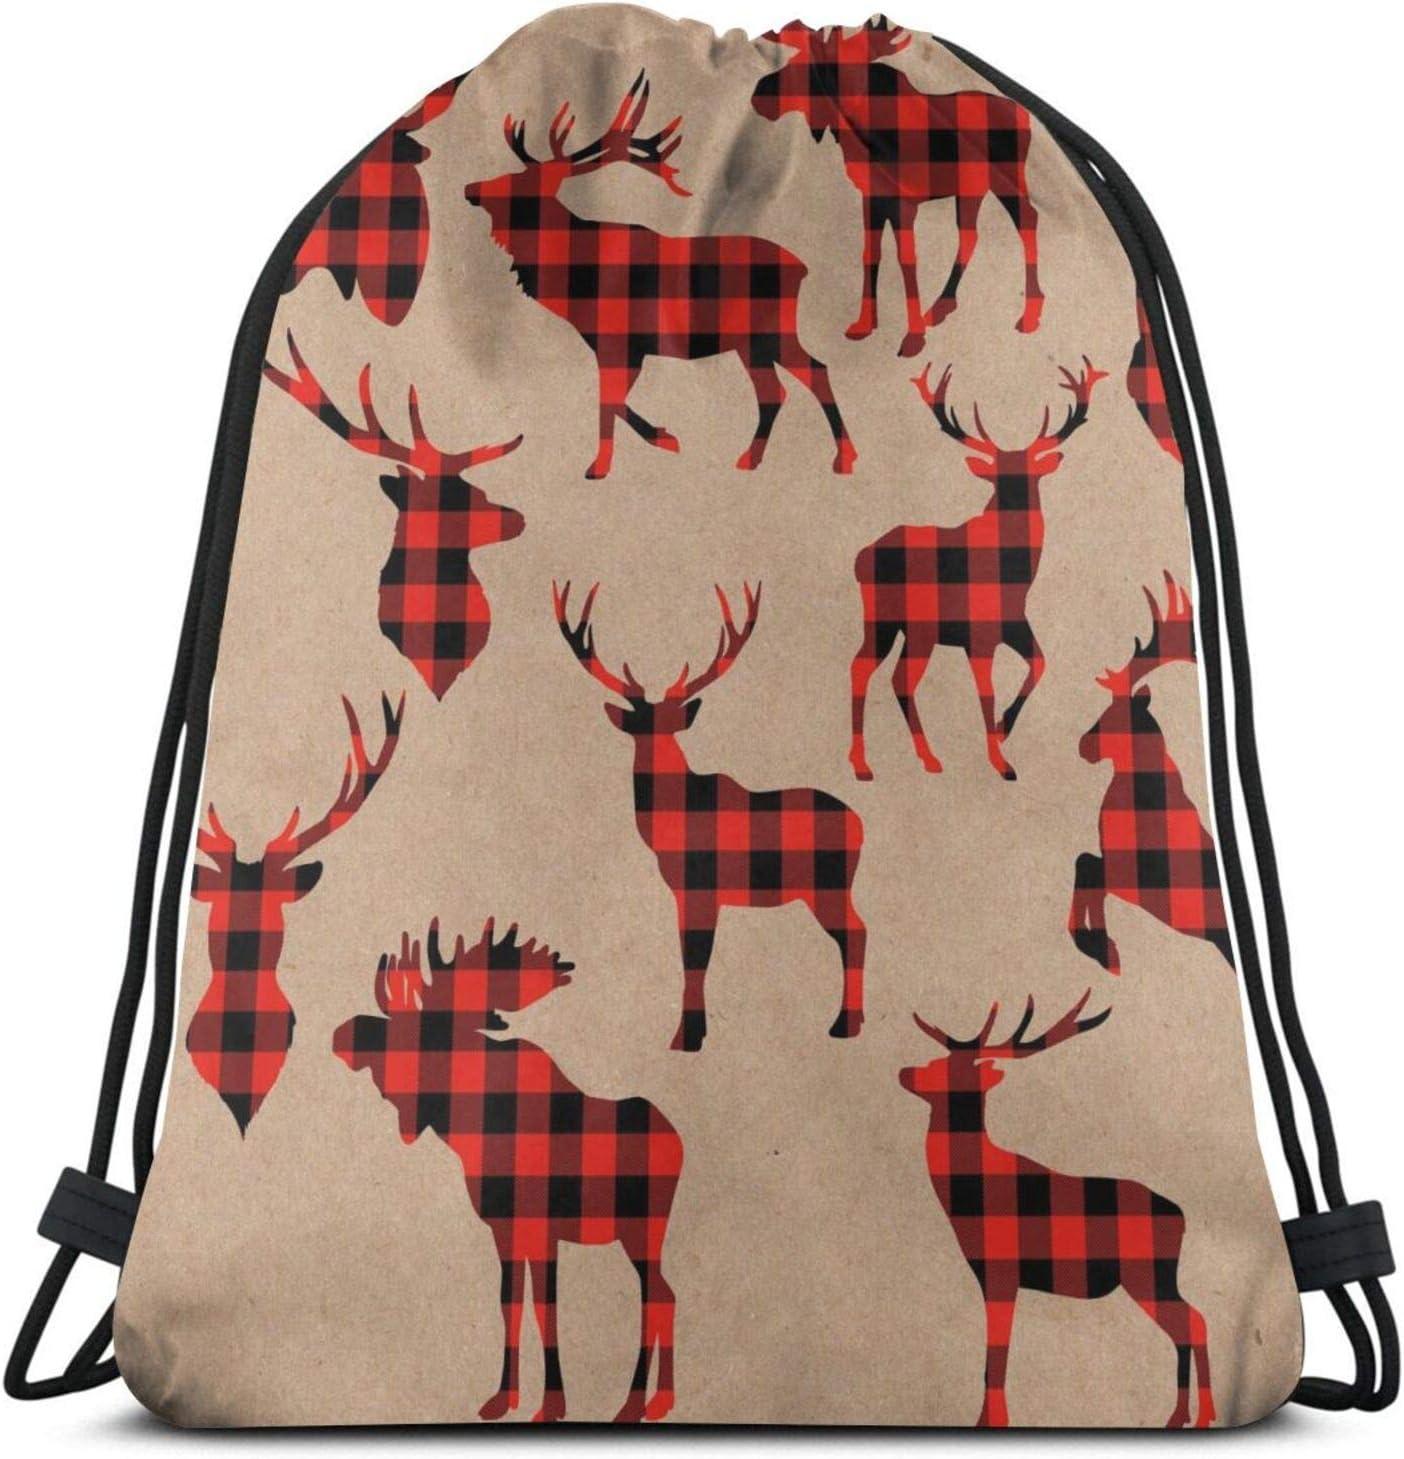 1 year warranty Sport Gym Sackpack Max 52% OFF String Cinch Unisex Backpack Drawstring Sack